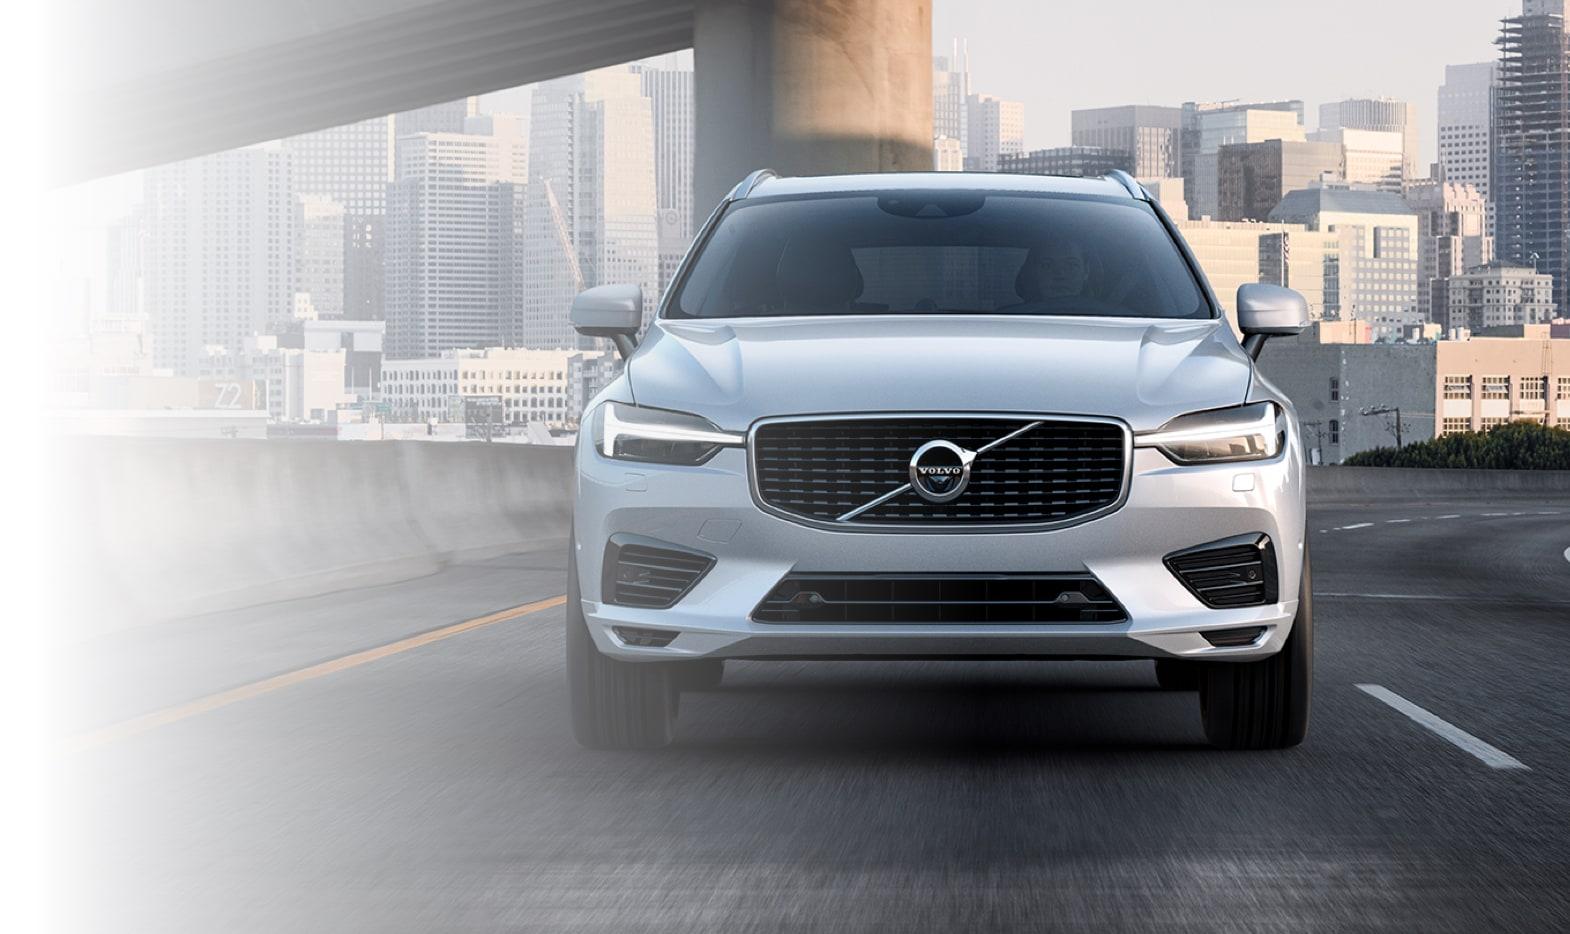 Greensboro Crown Volvo | New 2018-2019 Volvo & Used Car Dealer